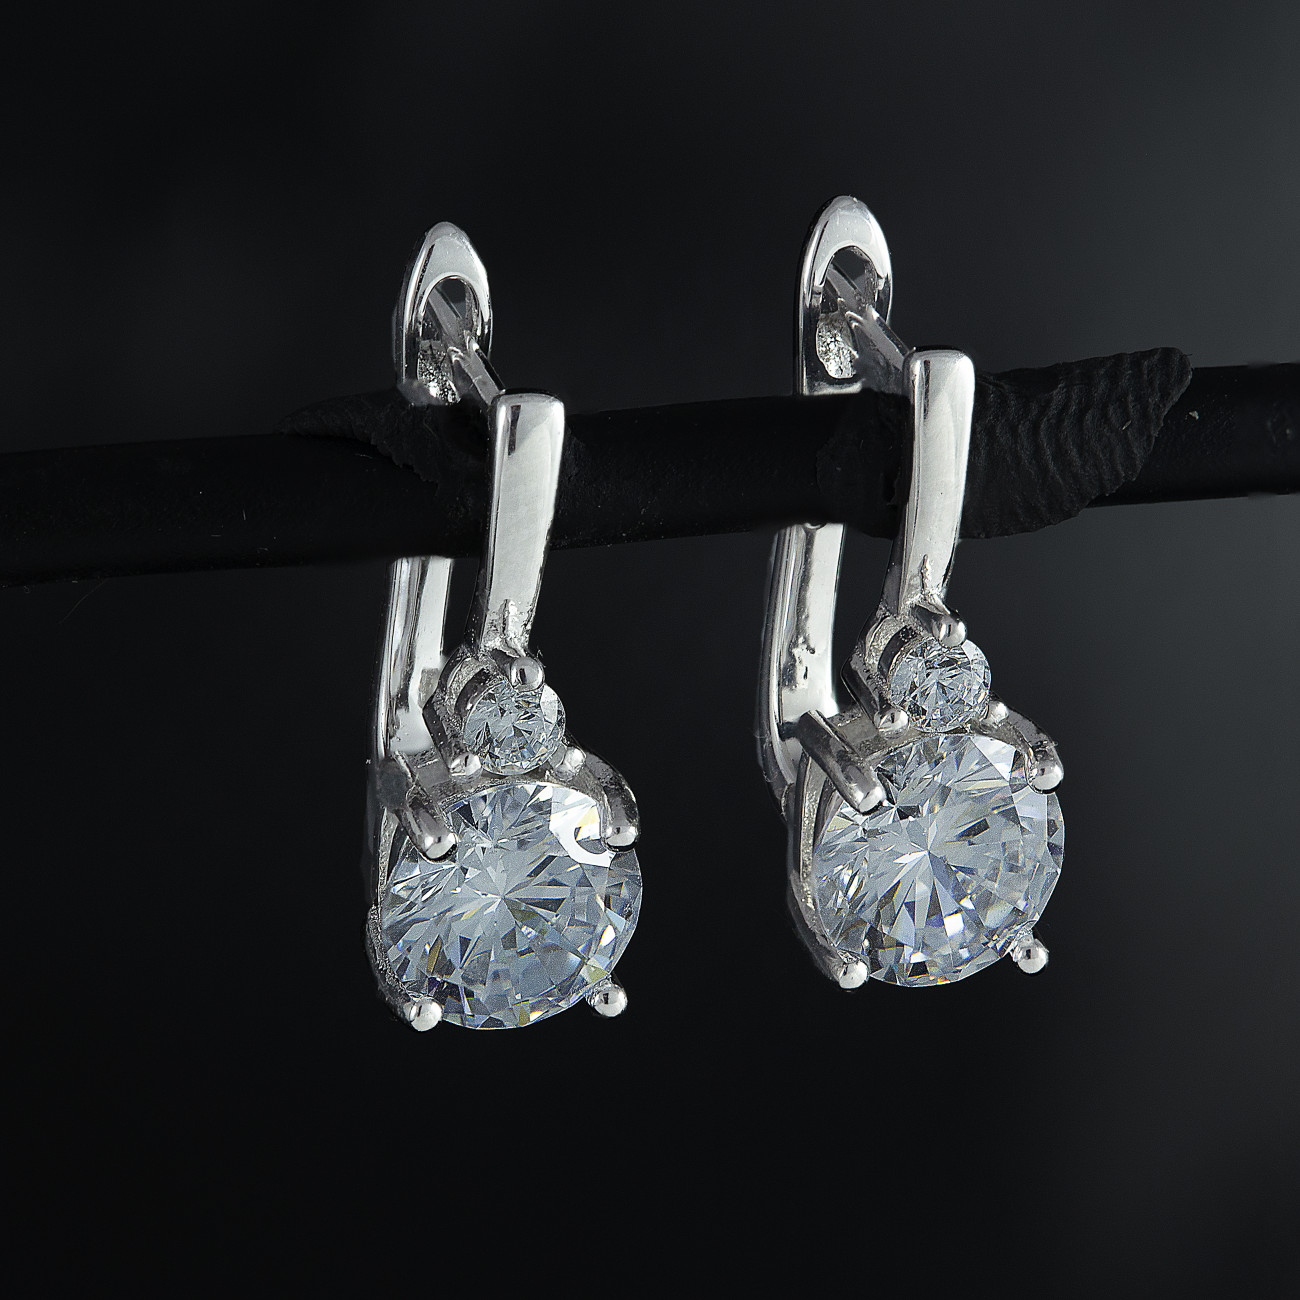 Visací, stříbrné náušnice  Savour elegance